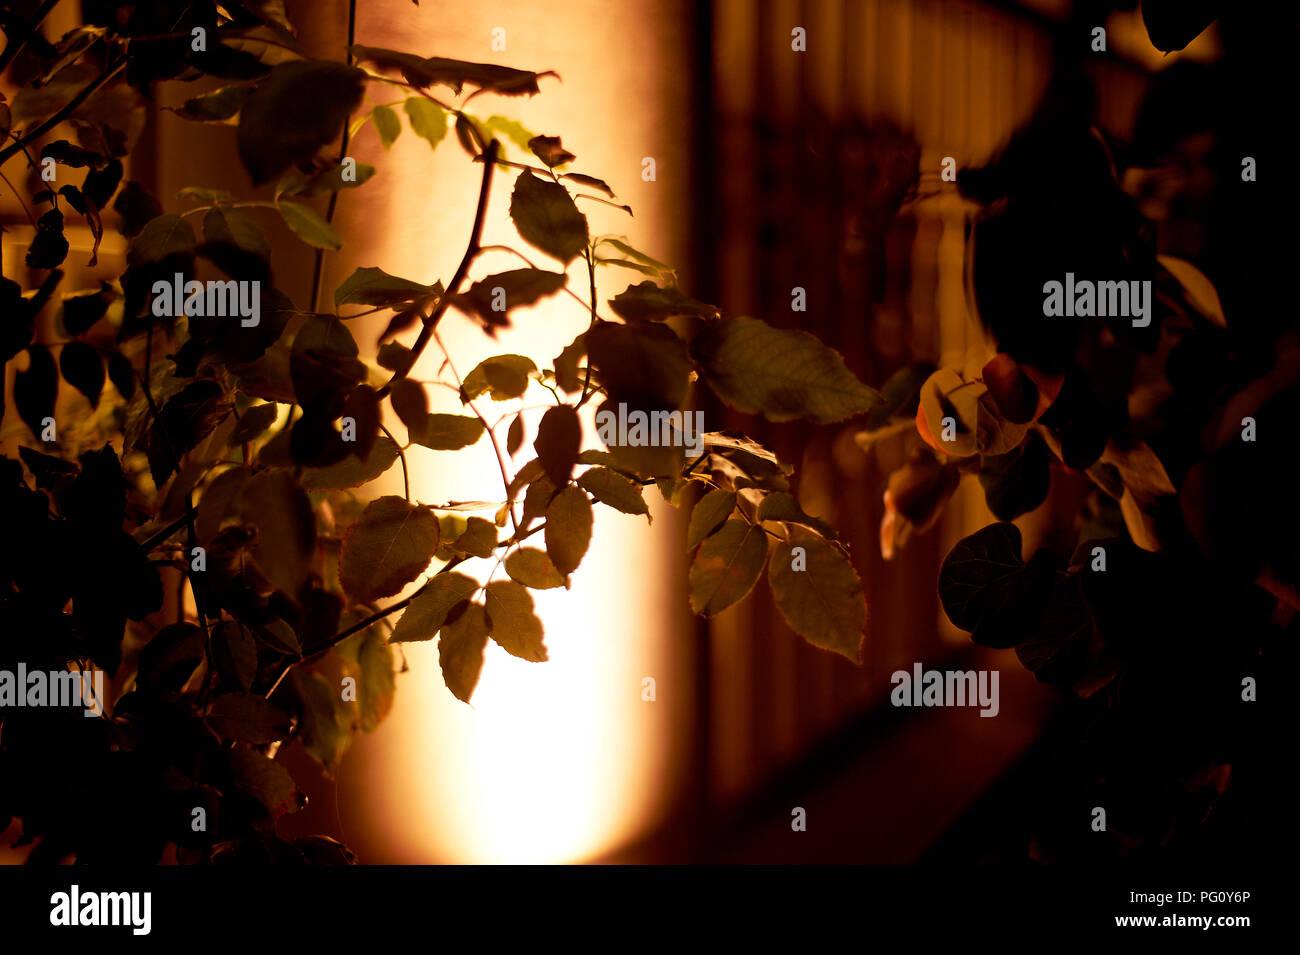 Foliage with bright neon night illumination.Abstract background - Stock Image